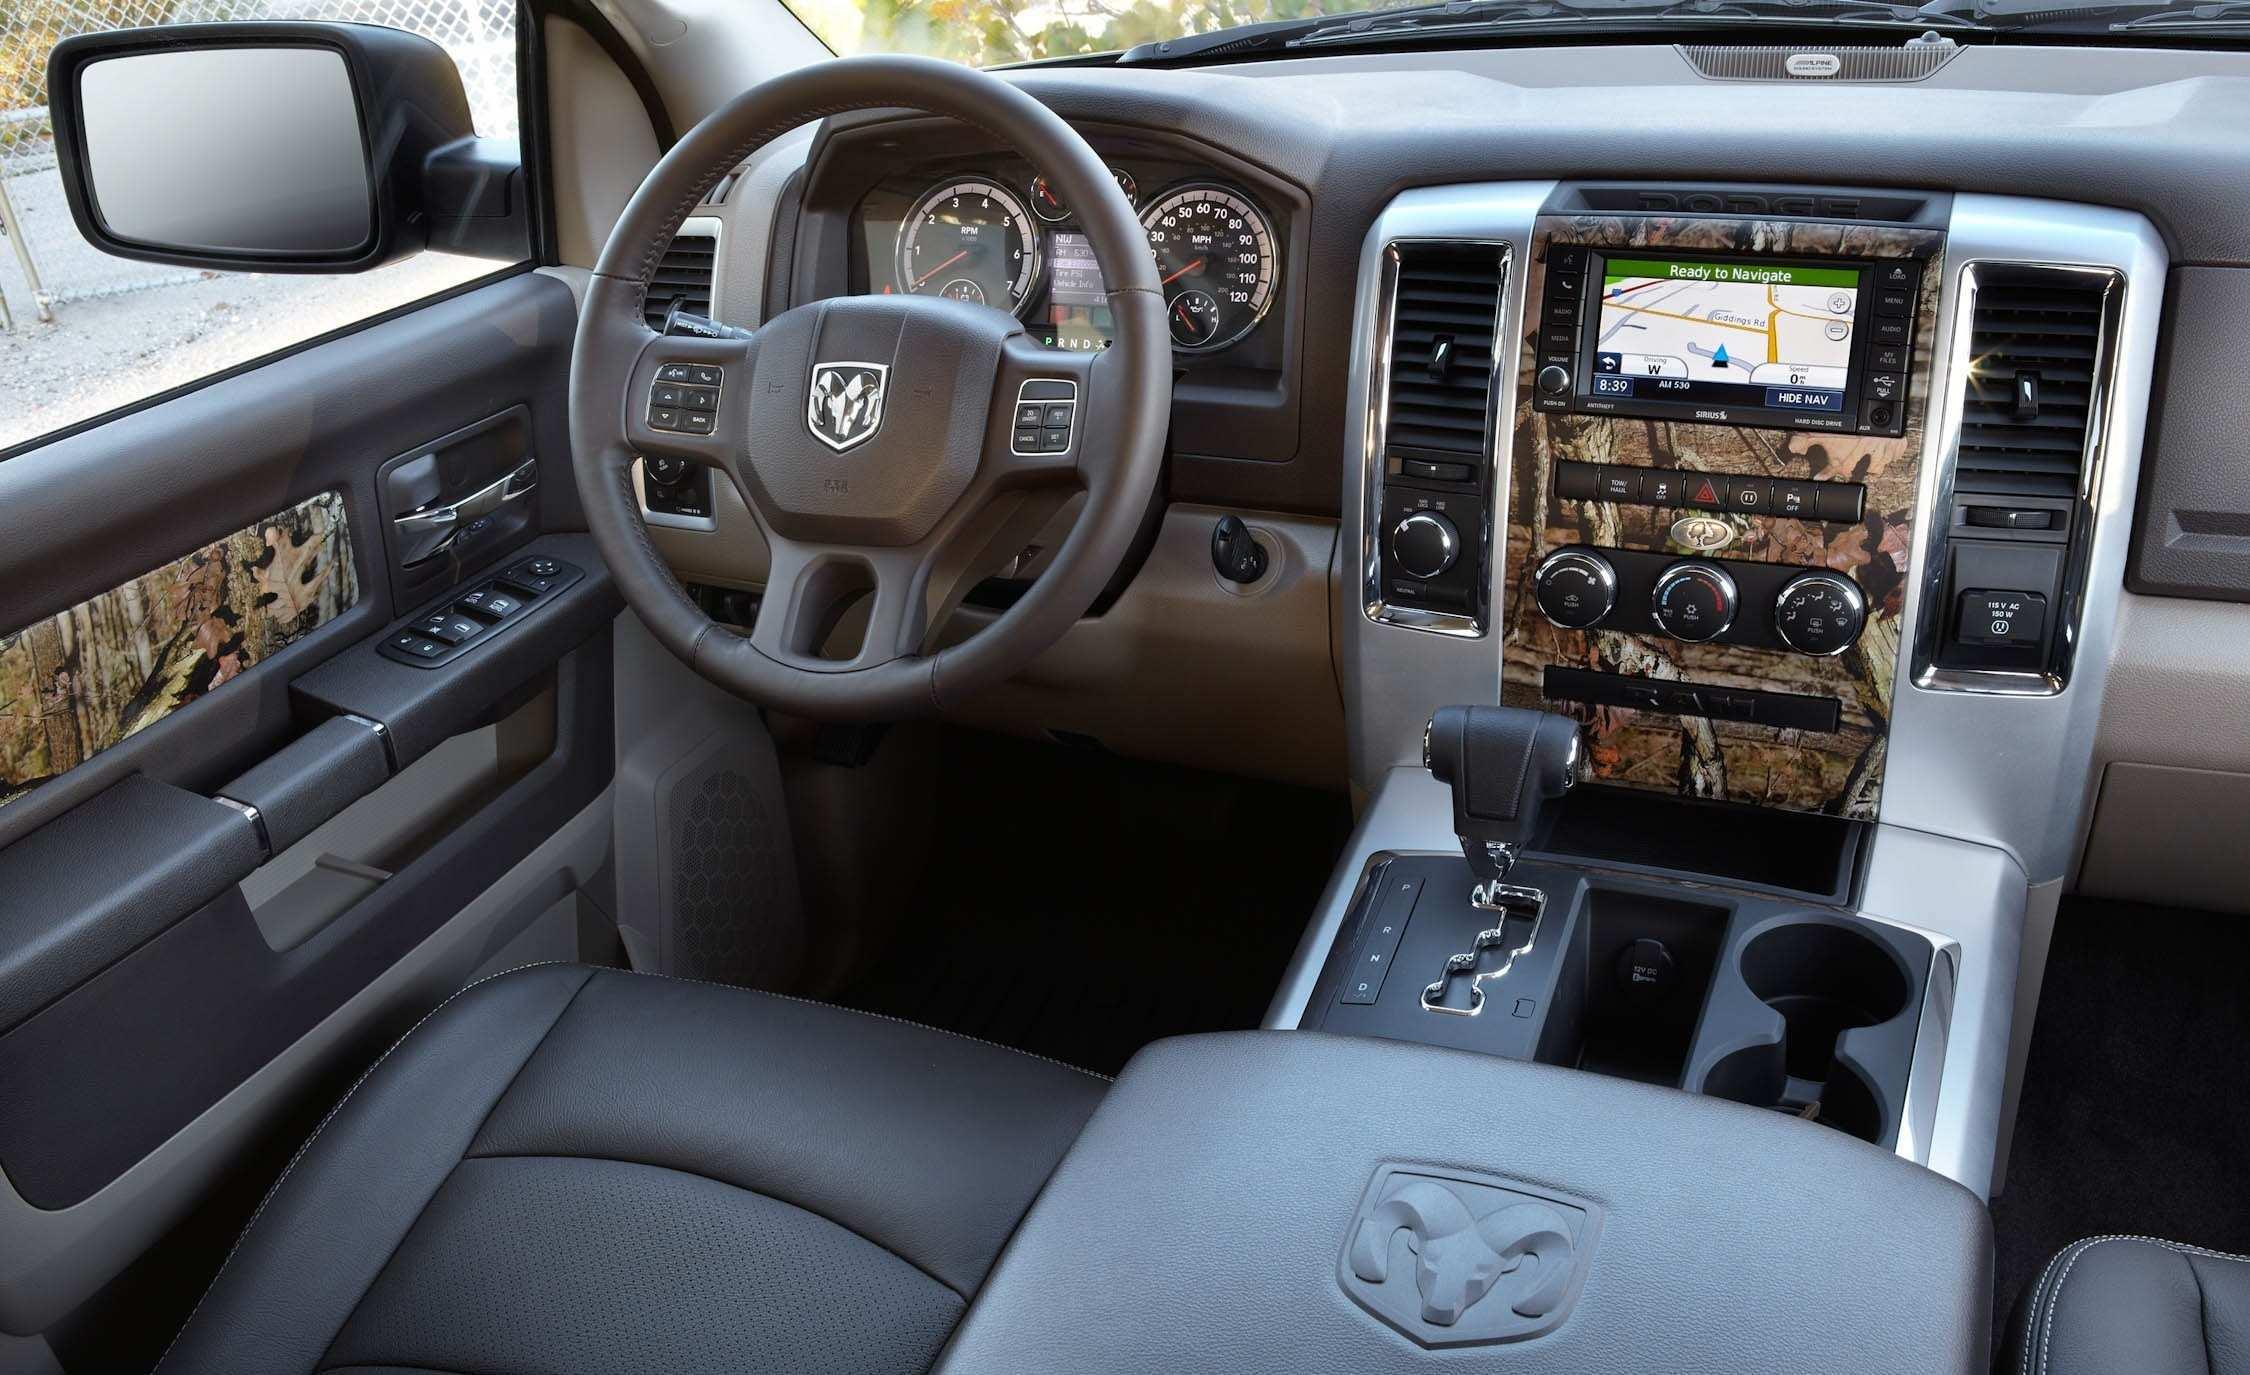 36 Best Review 2020 Dodge Ram Interior Spy Shoot with 2020 Dodge Ram Interior